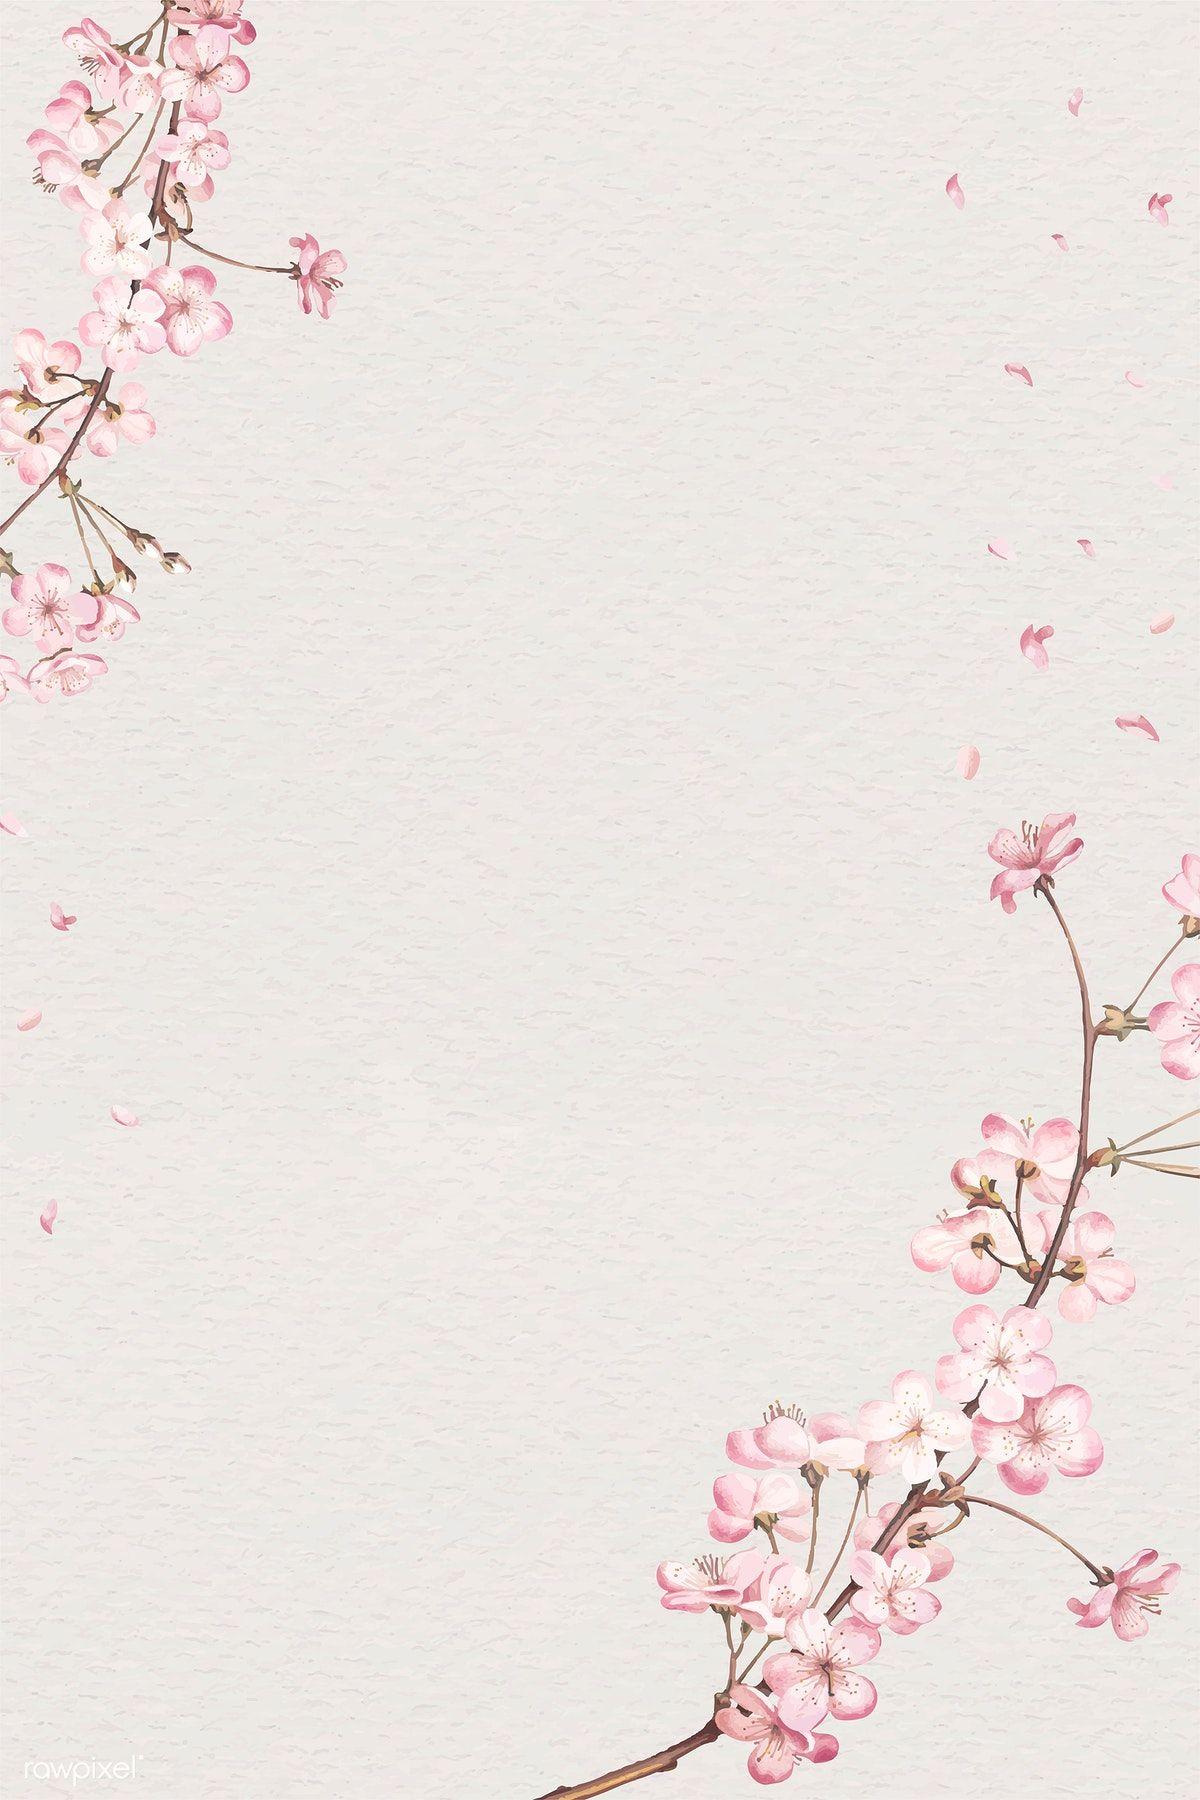 Download premium vector of Blank pink floral card illustration 894151